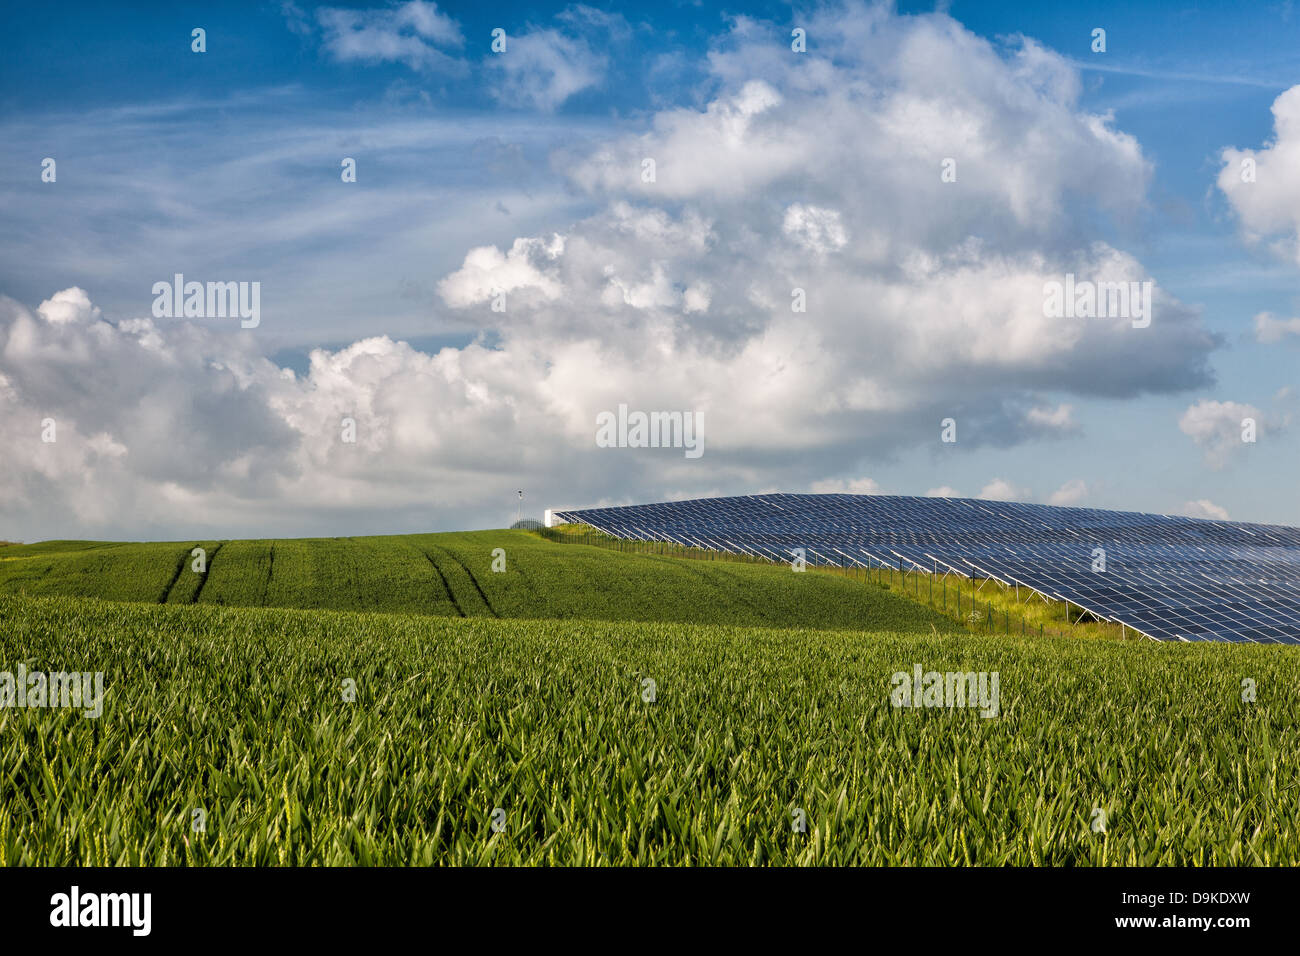 Silicon solar energy panels on green corn field - Stock Image